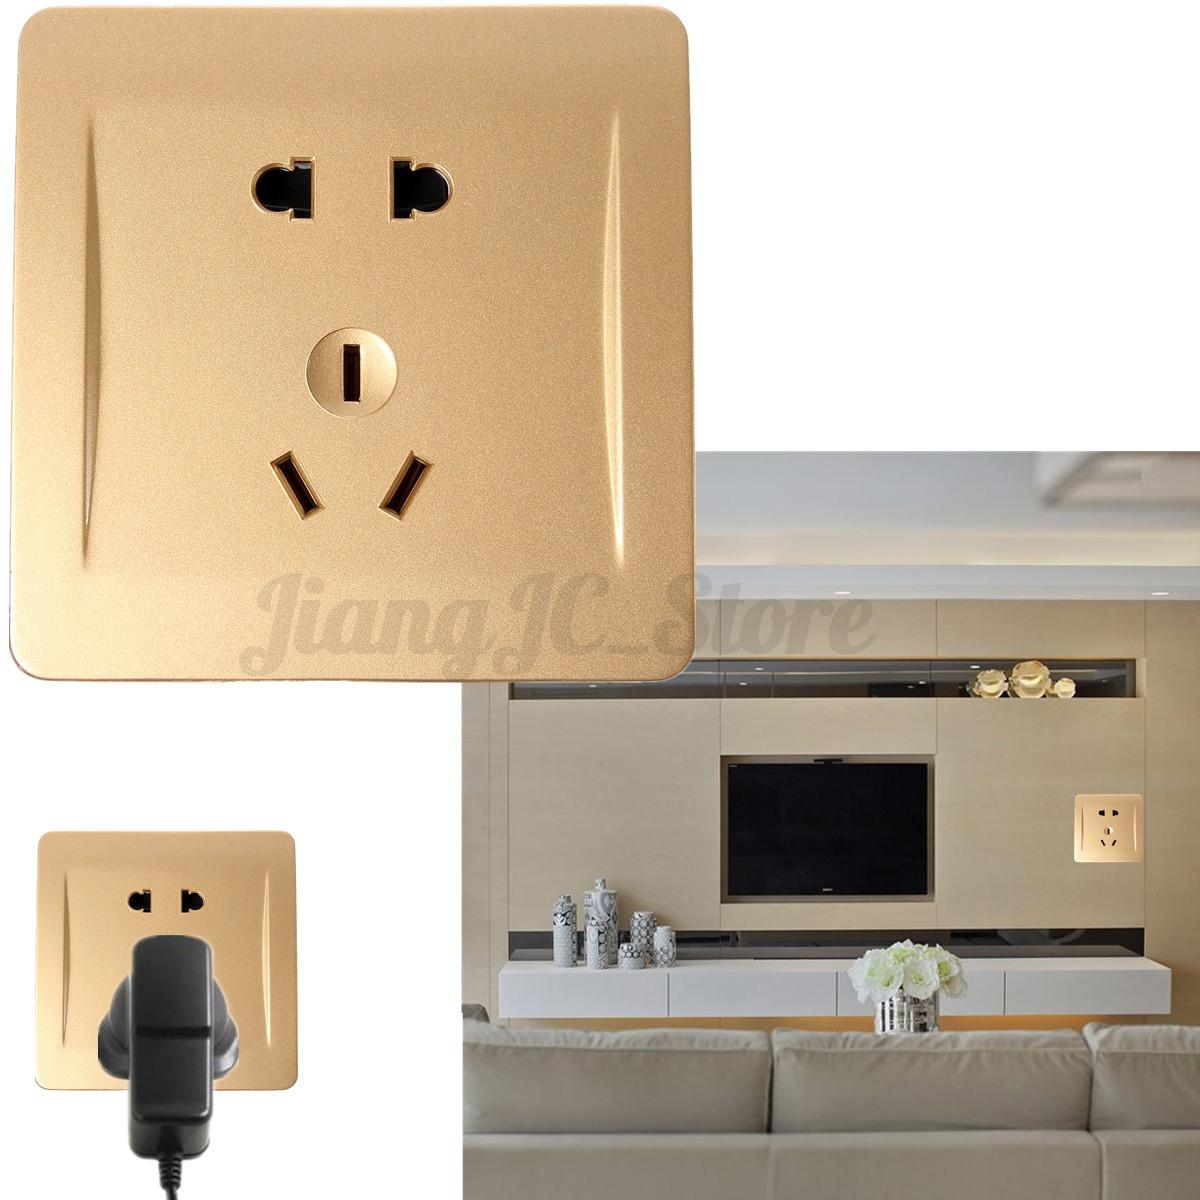 universal electrical au usb power outlet light switch wall socket tv lan frame ebay